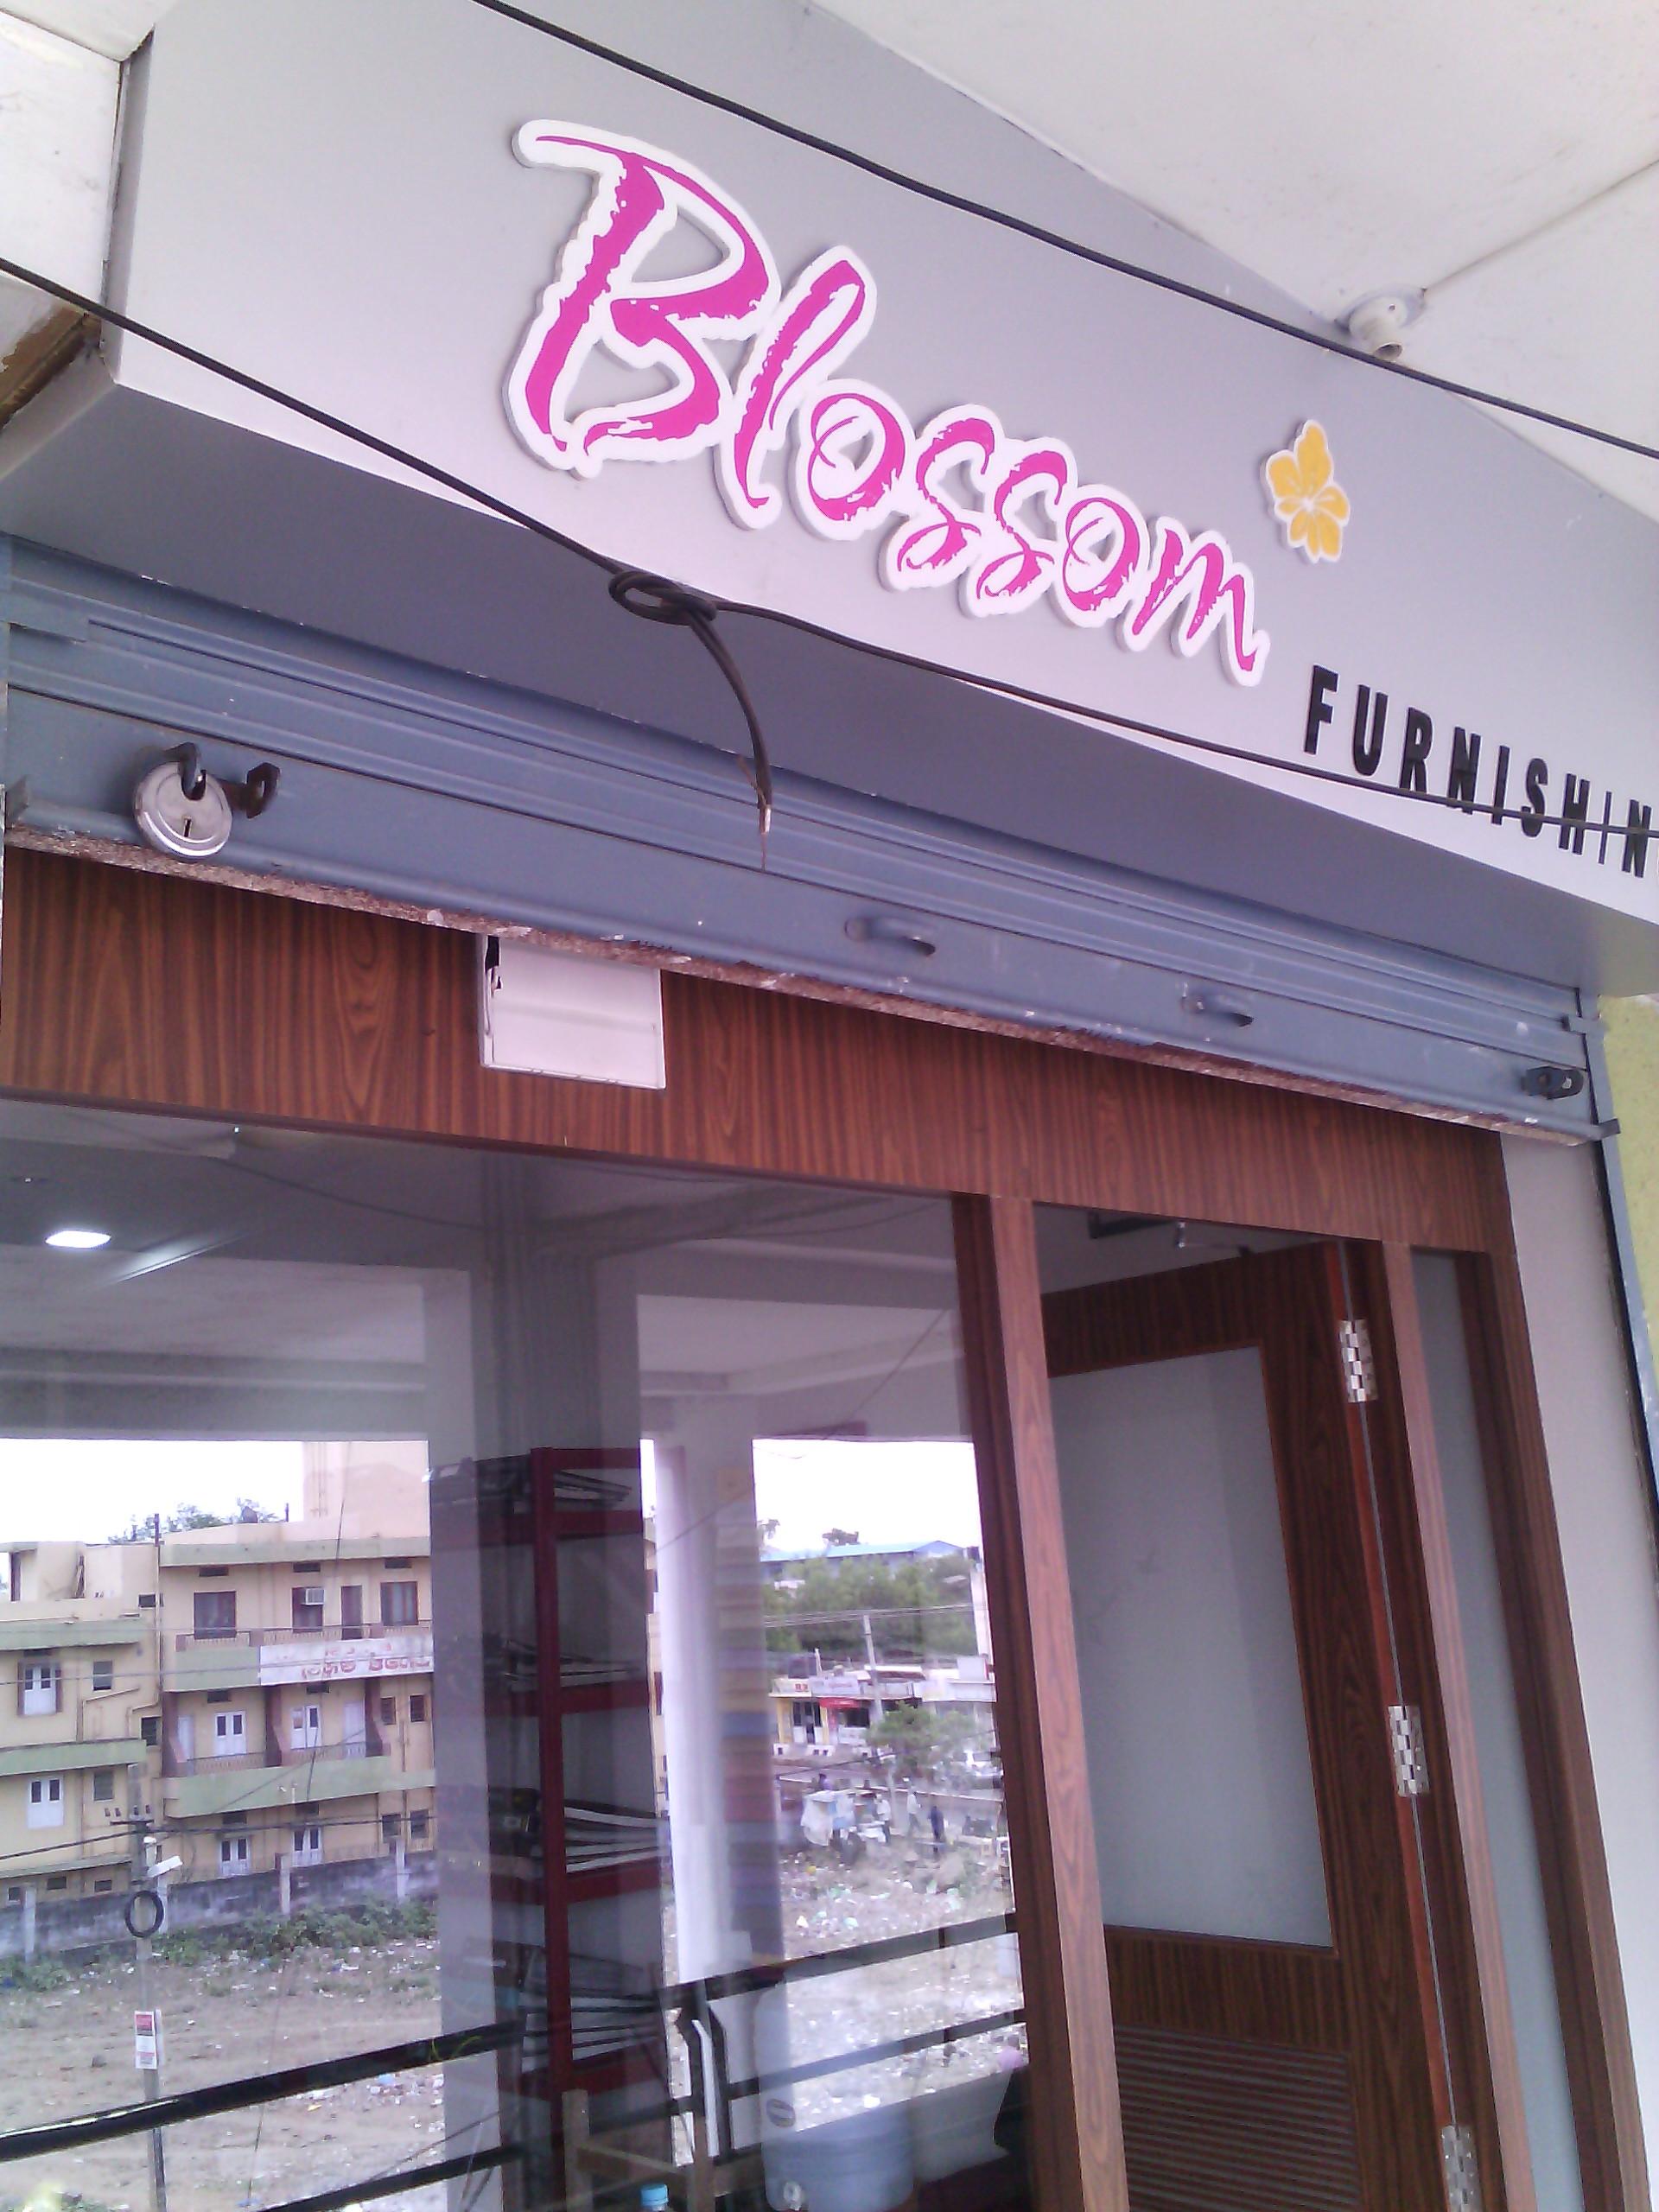 Blossom Furnishing